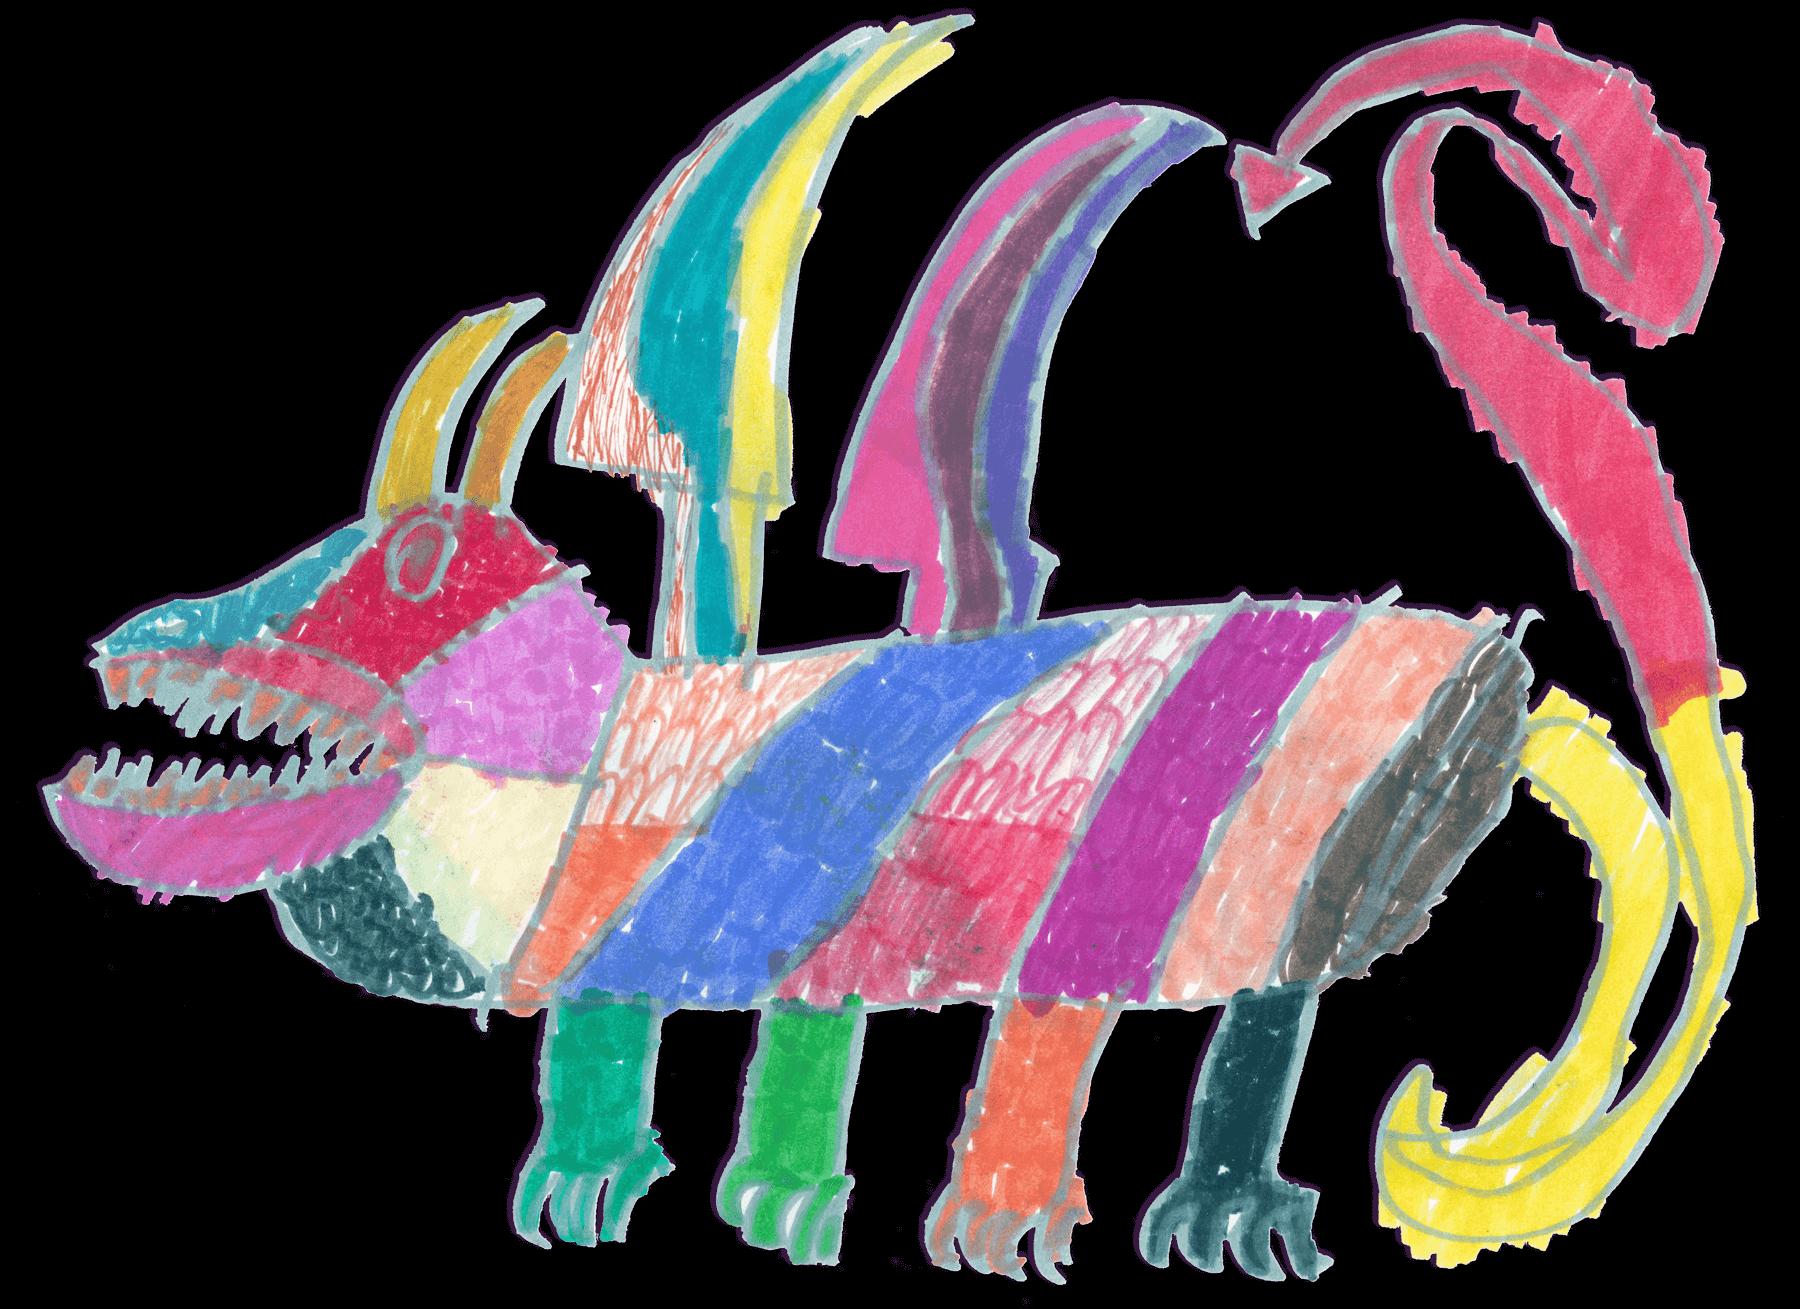 Marker drawing of a Technicolor Dragon by Manès Weiner-Slanar